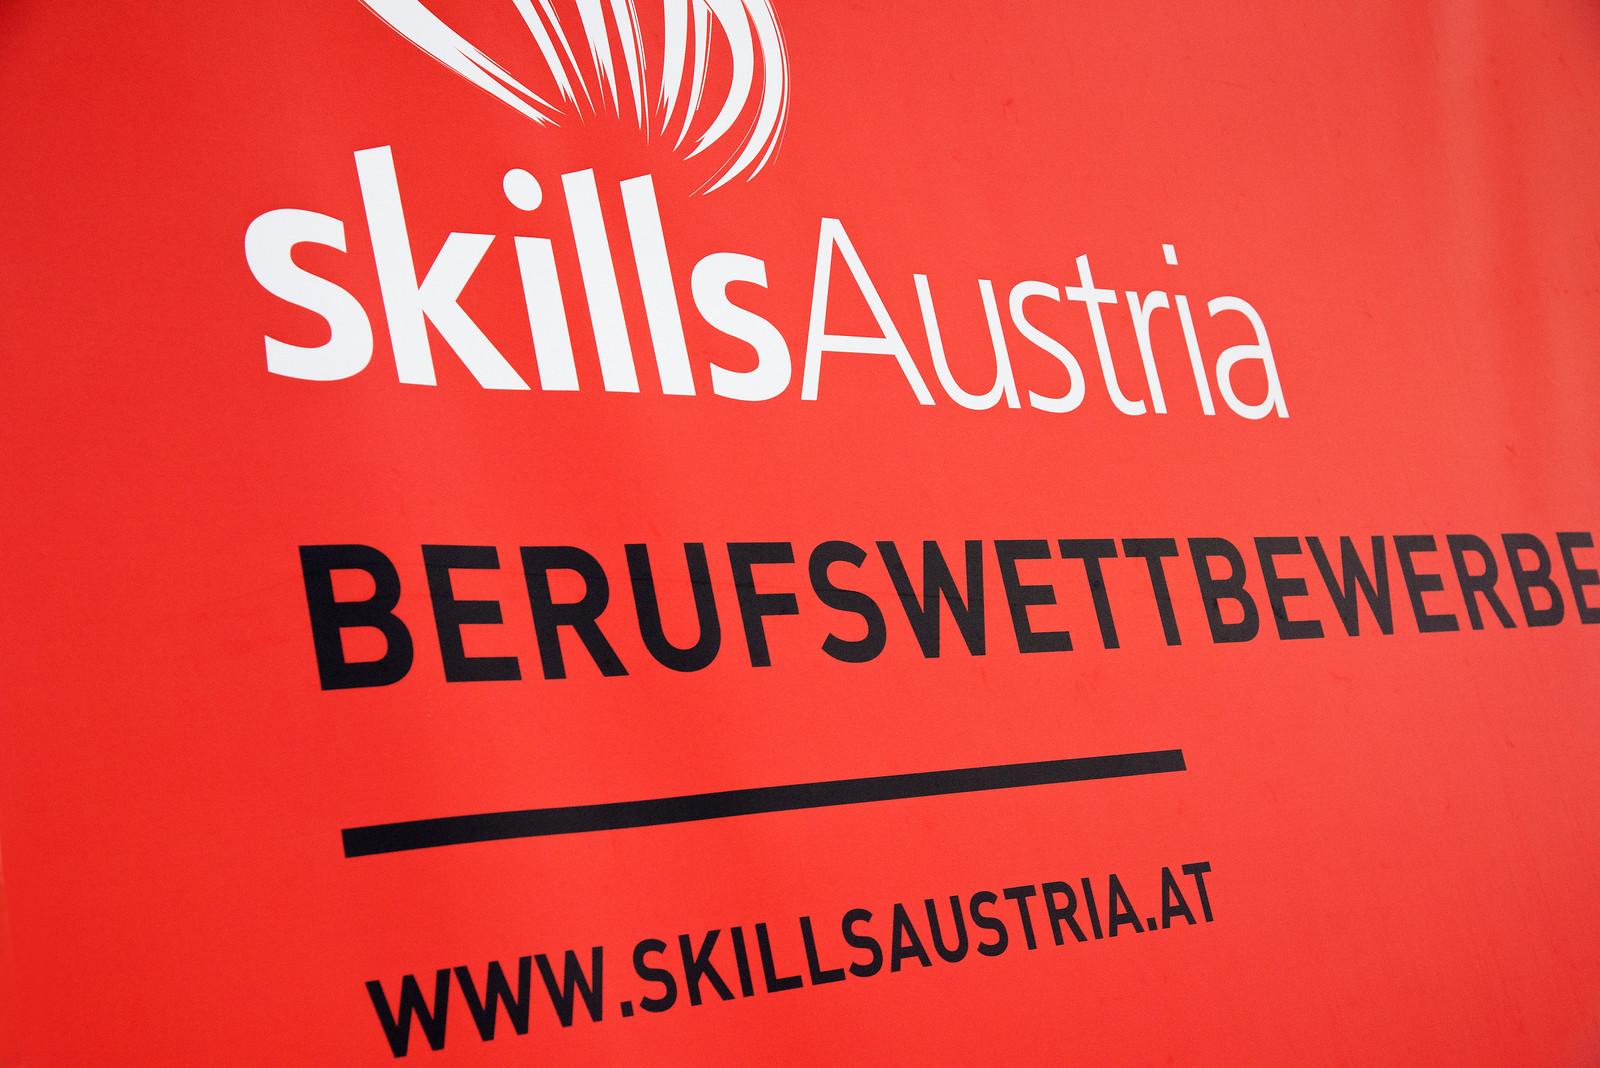 AustrianSkills2016 | 17. - 20. November 2016 in Salzburg